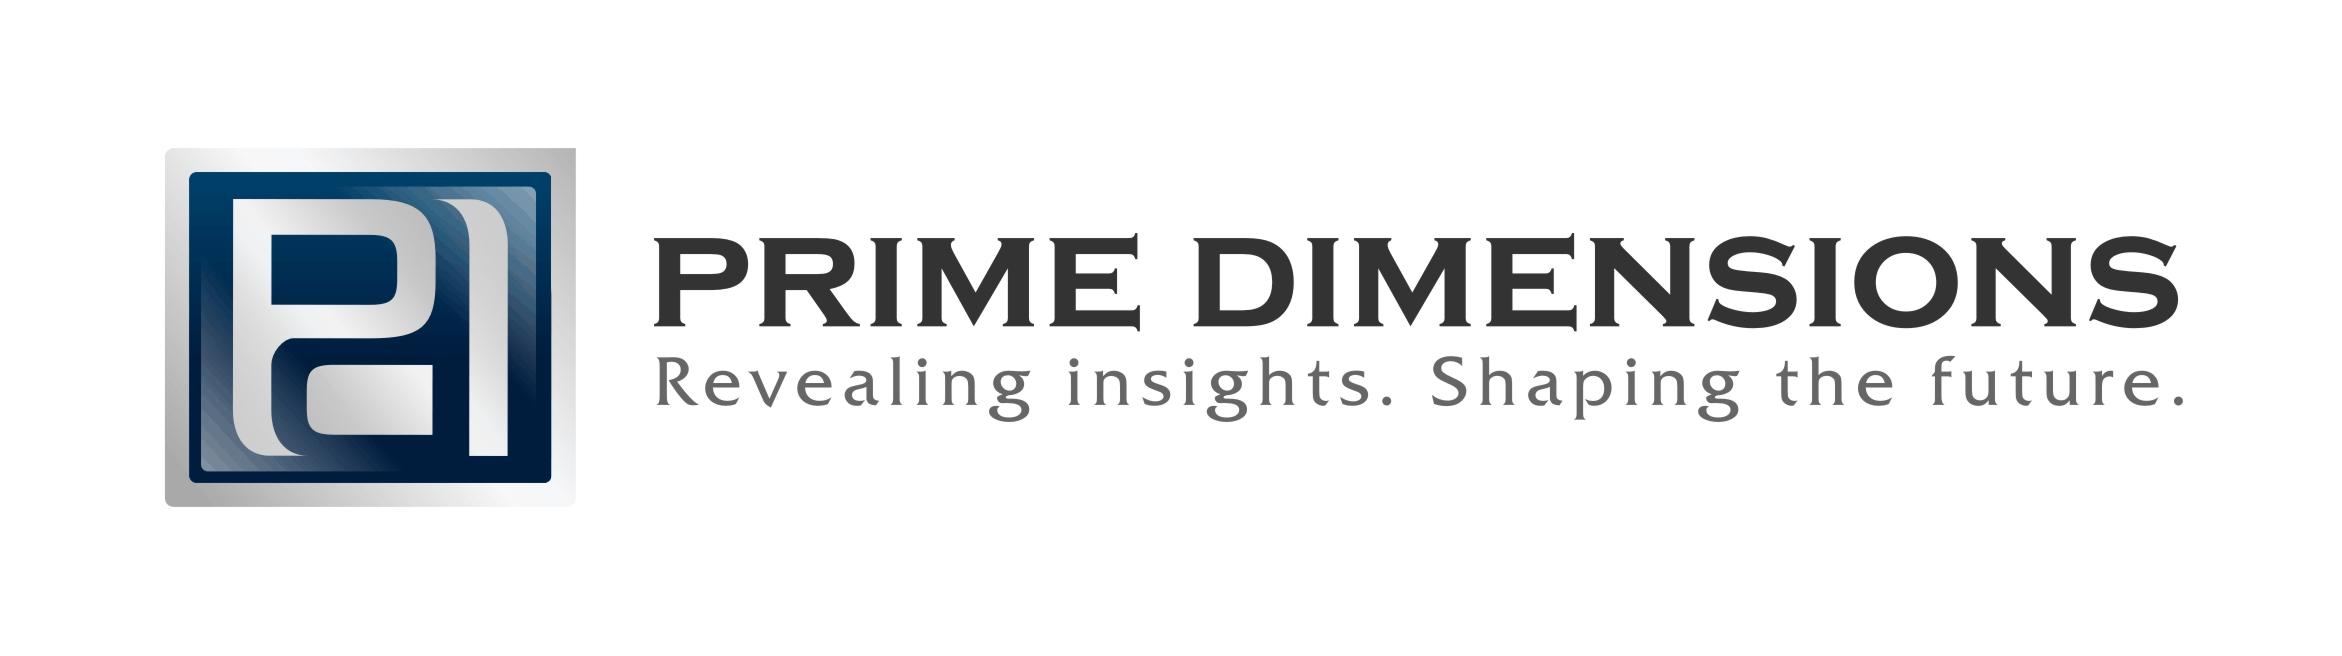 Prime-Dimensions-alt2-JPG